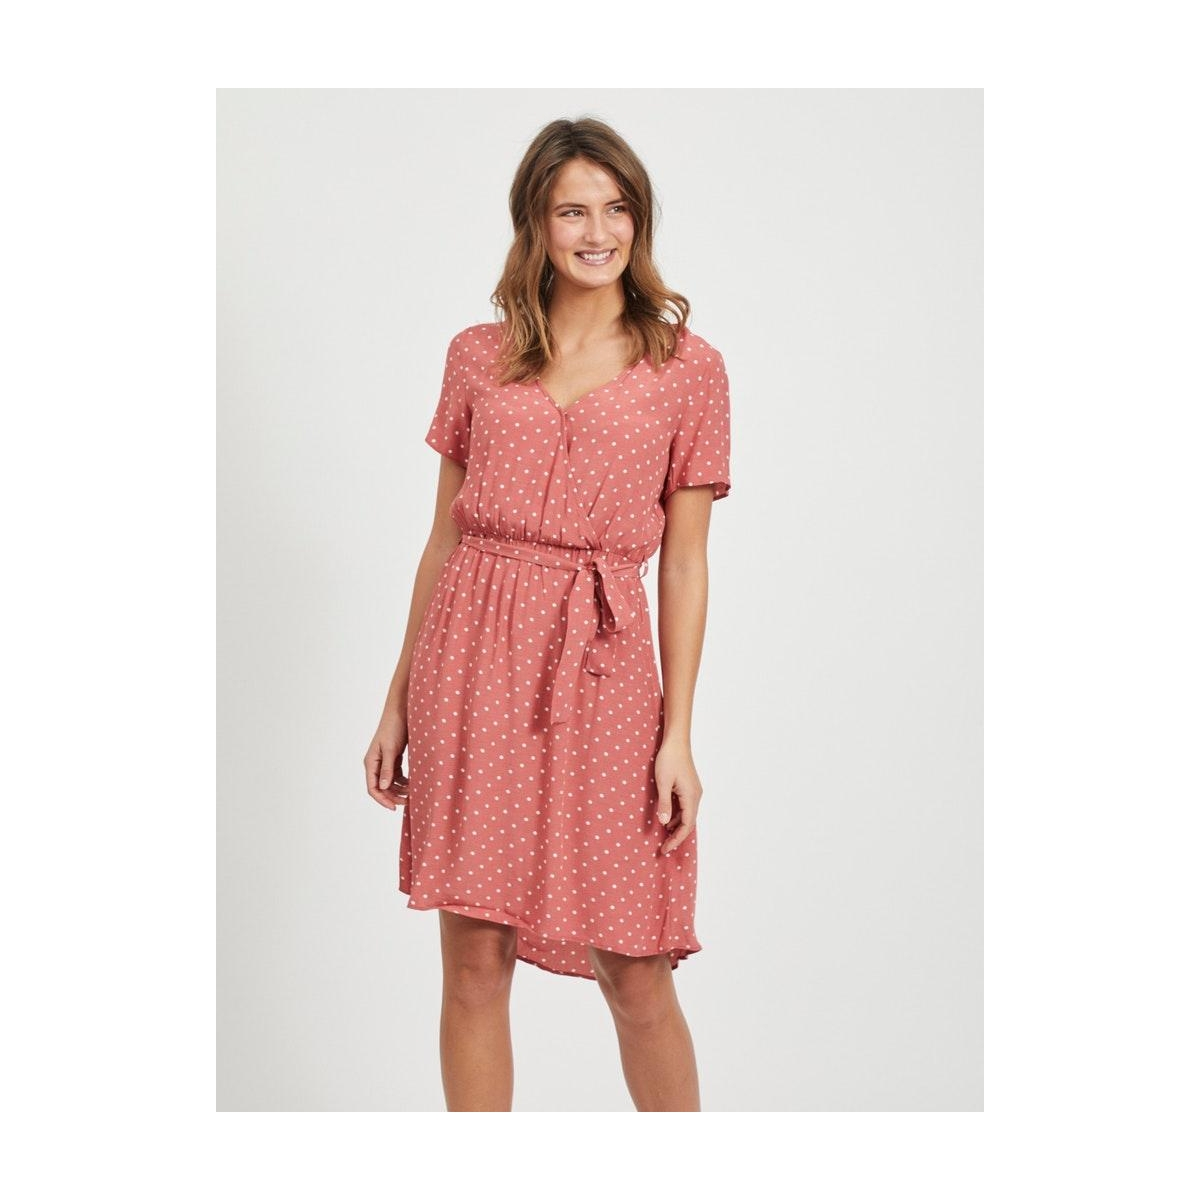 viprimera wrap s/s dress-fav lux 14055567 vila jurk dusty  cedar/snow white